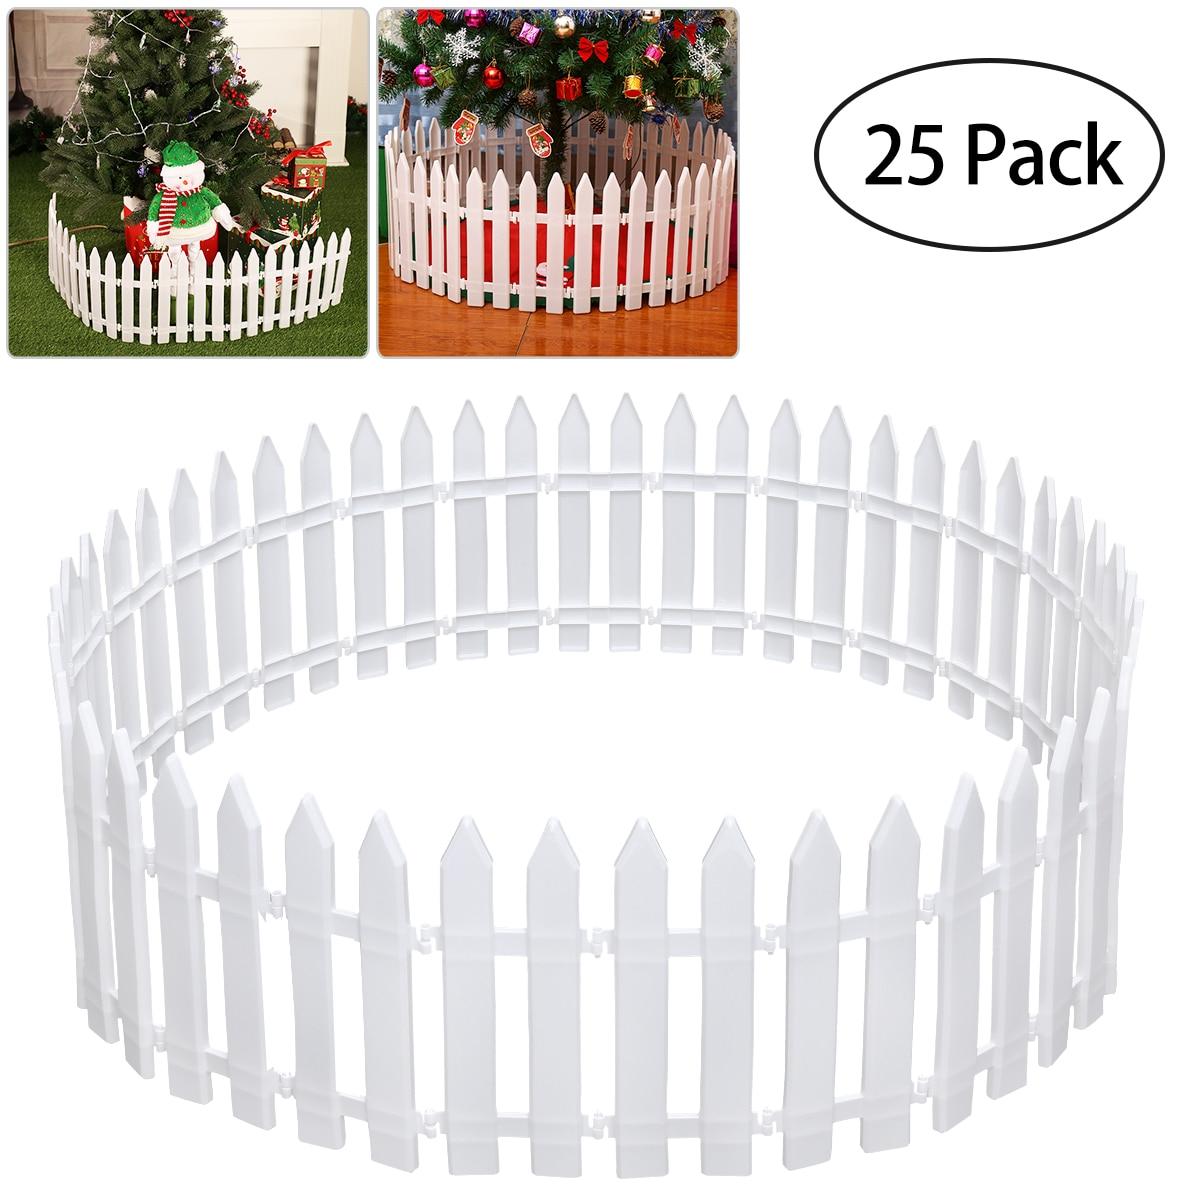 25 Pcs White Plastic Fence Miniature Home Garden Christmas Xmas Tree Wedding Party Decoration